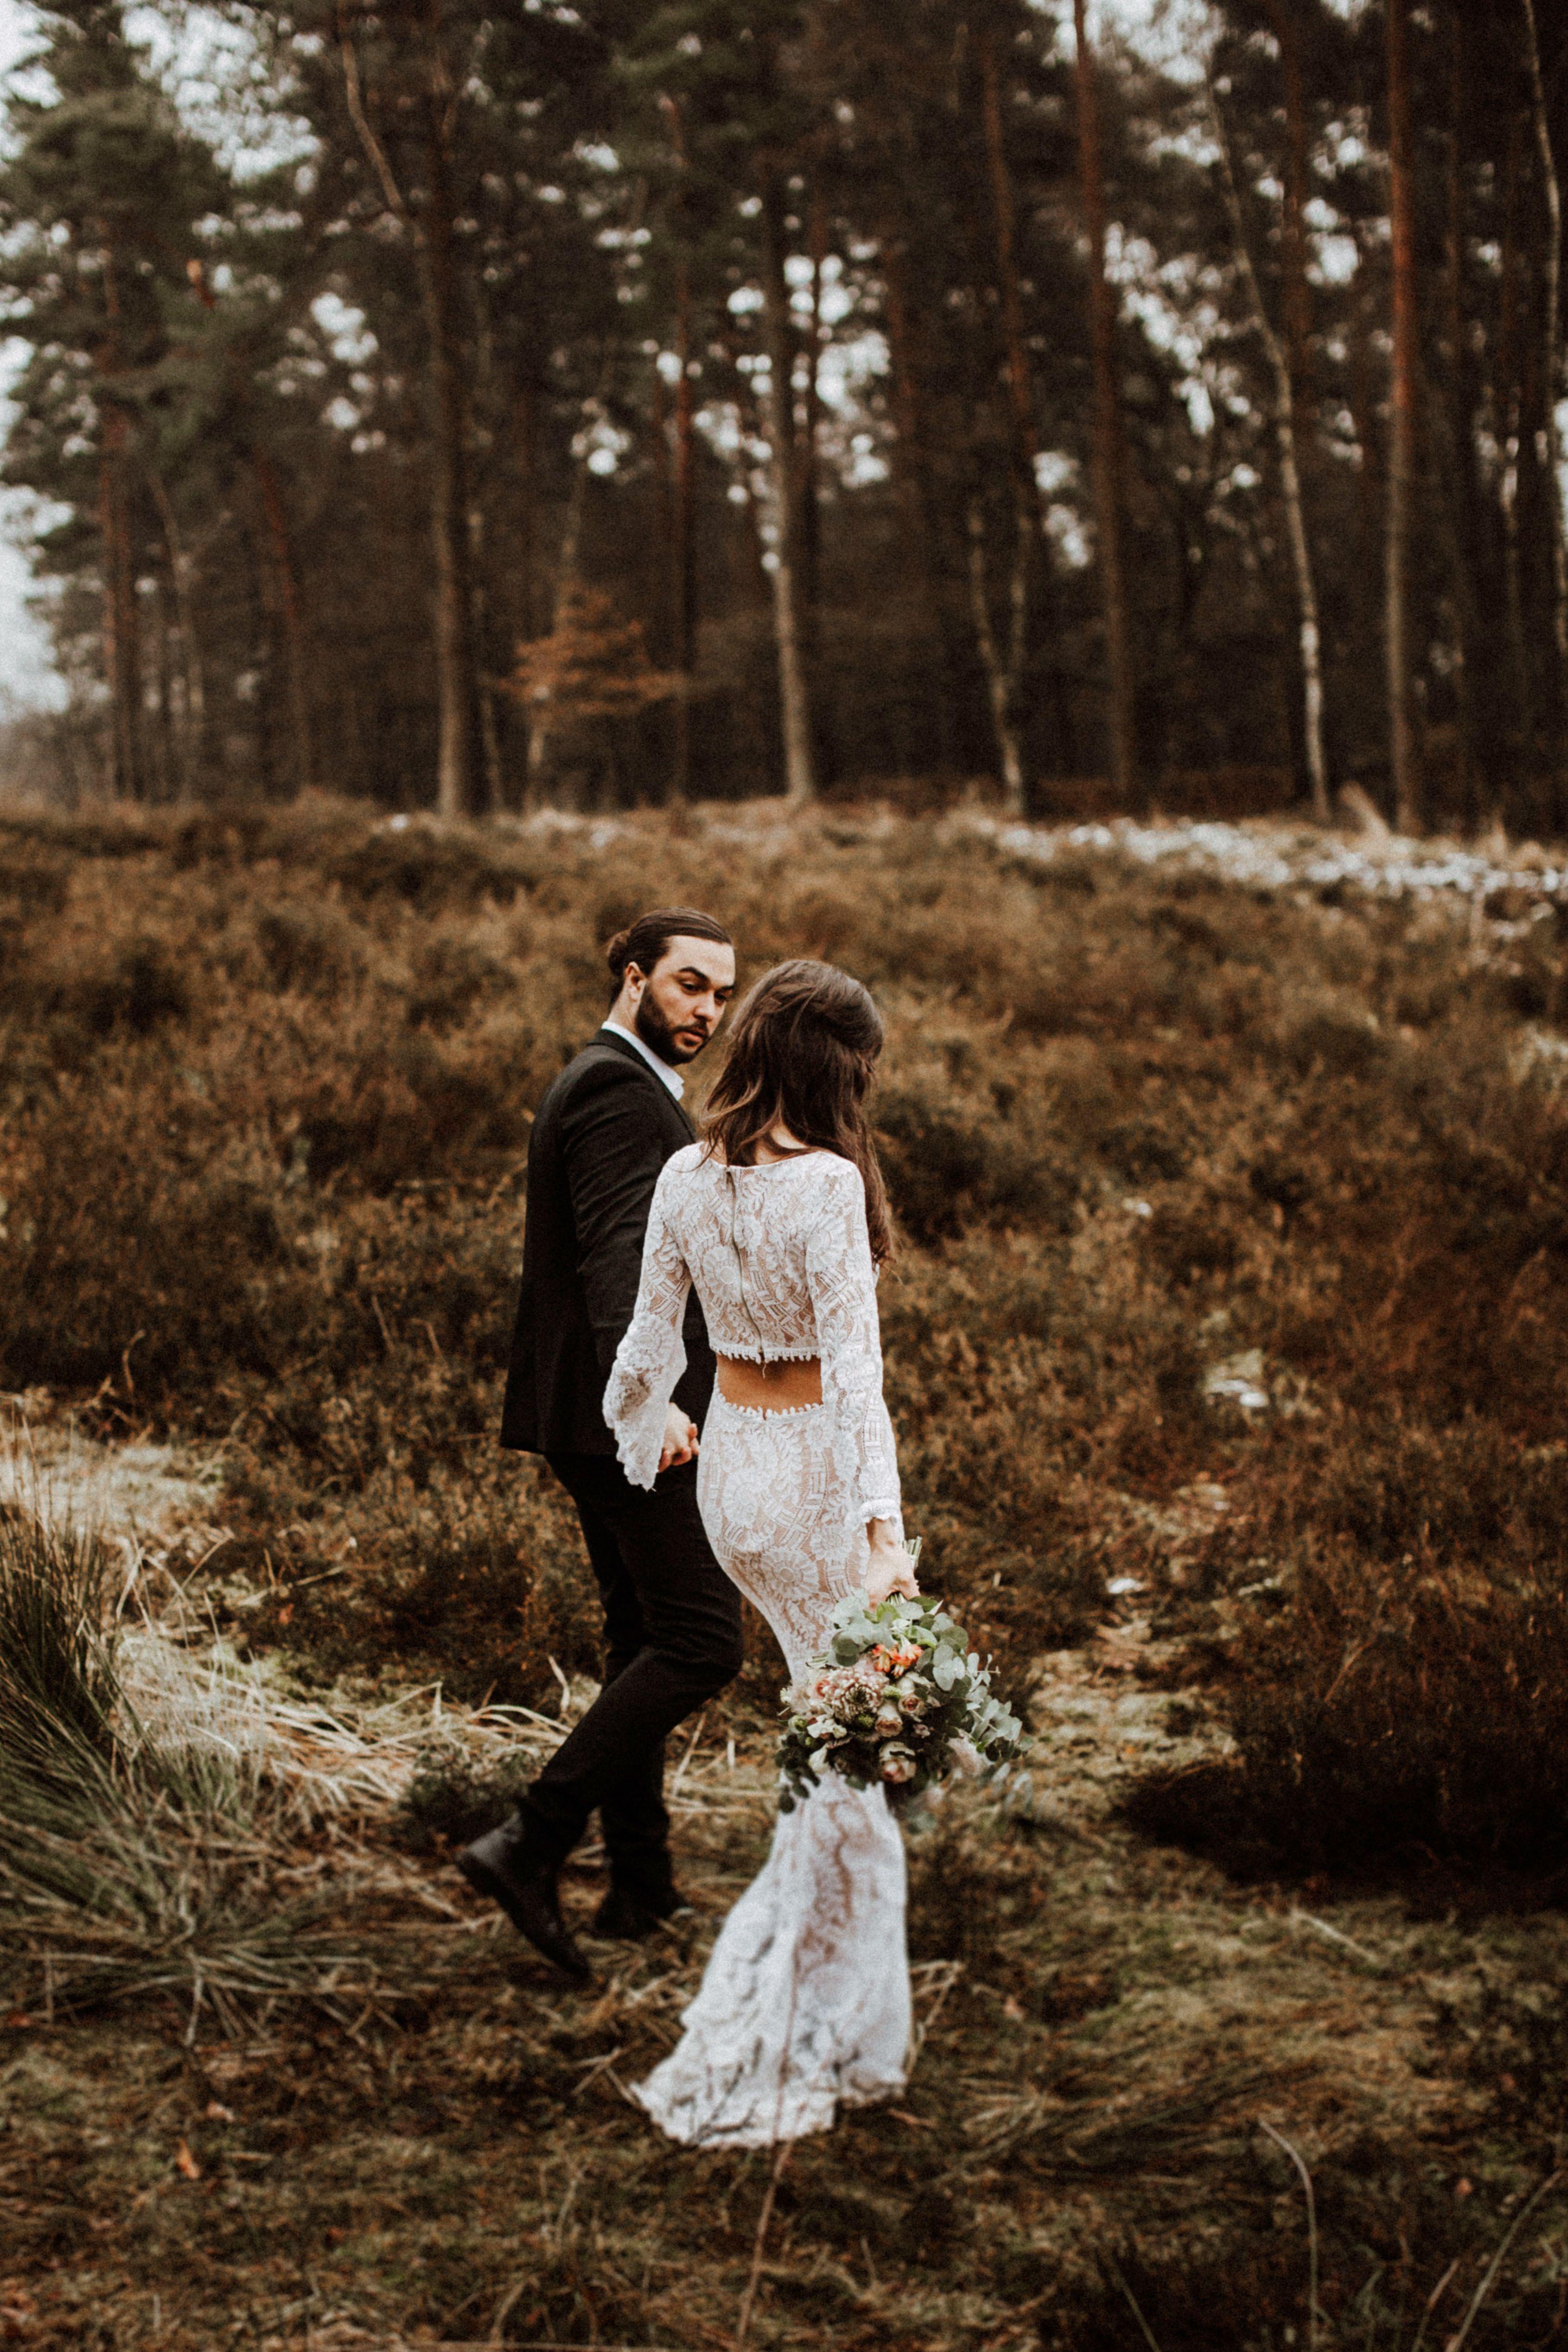 Brautpaar Shooting Boho Inspired Authentische